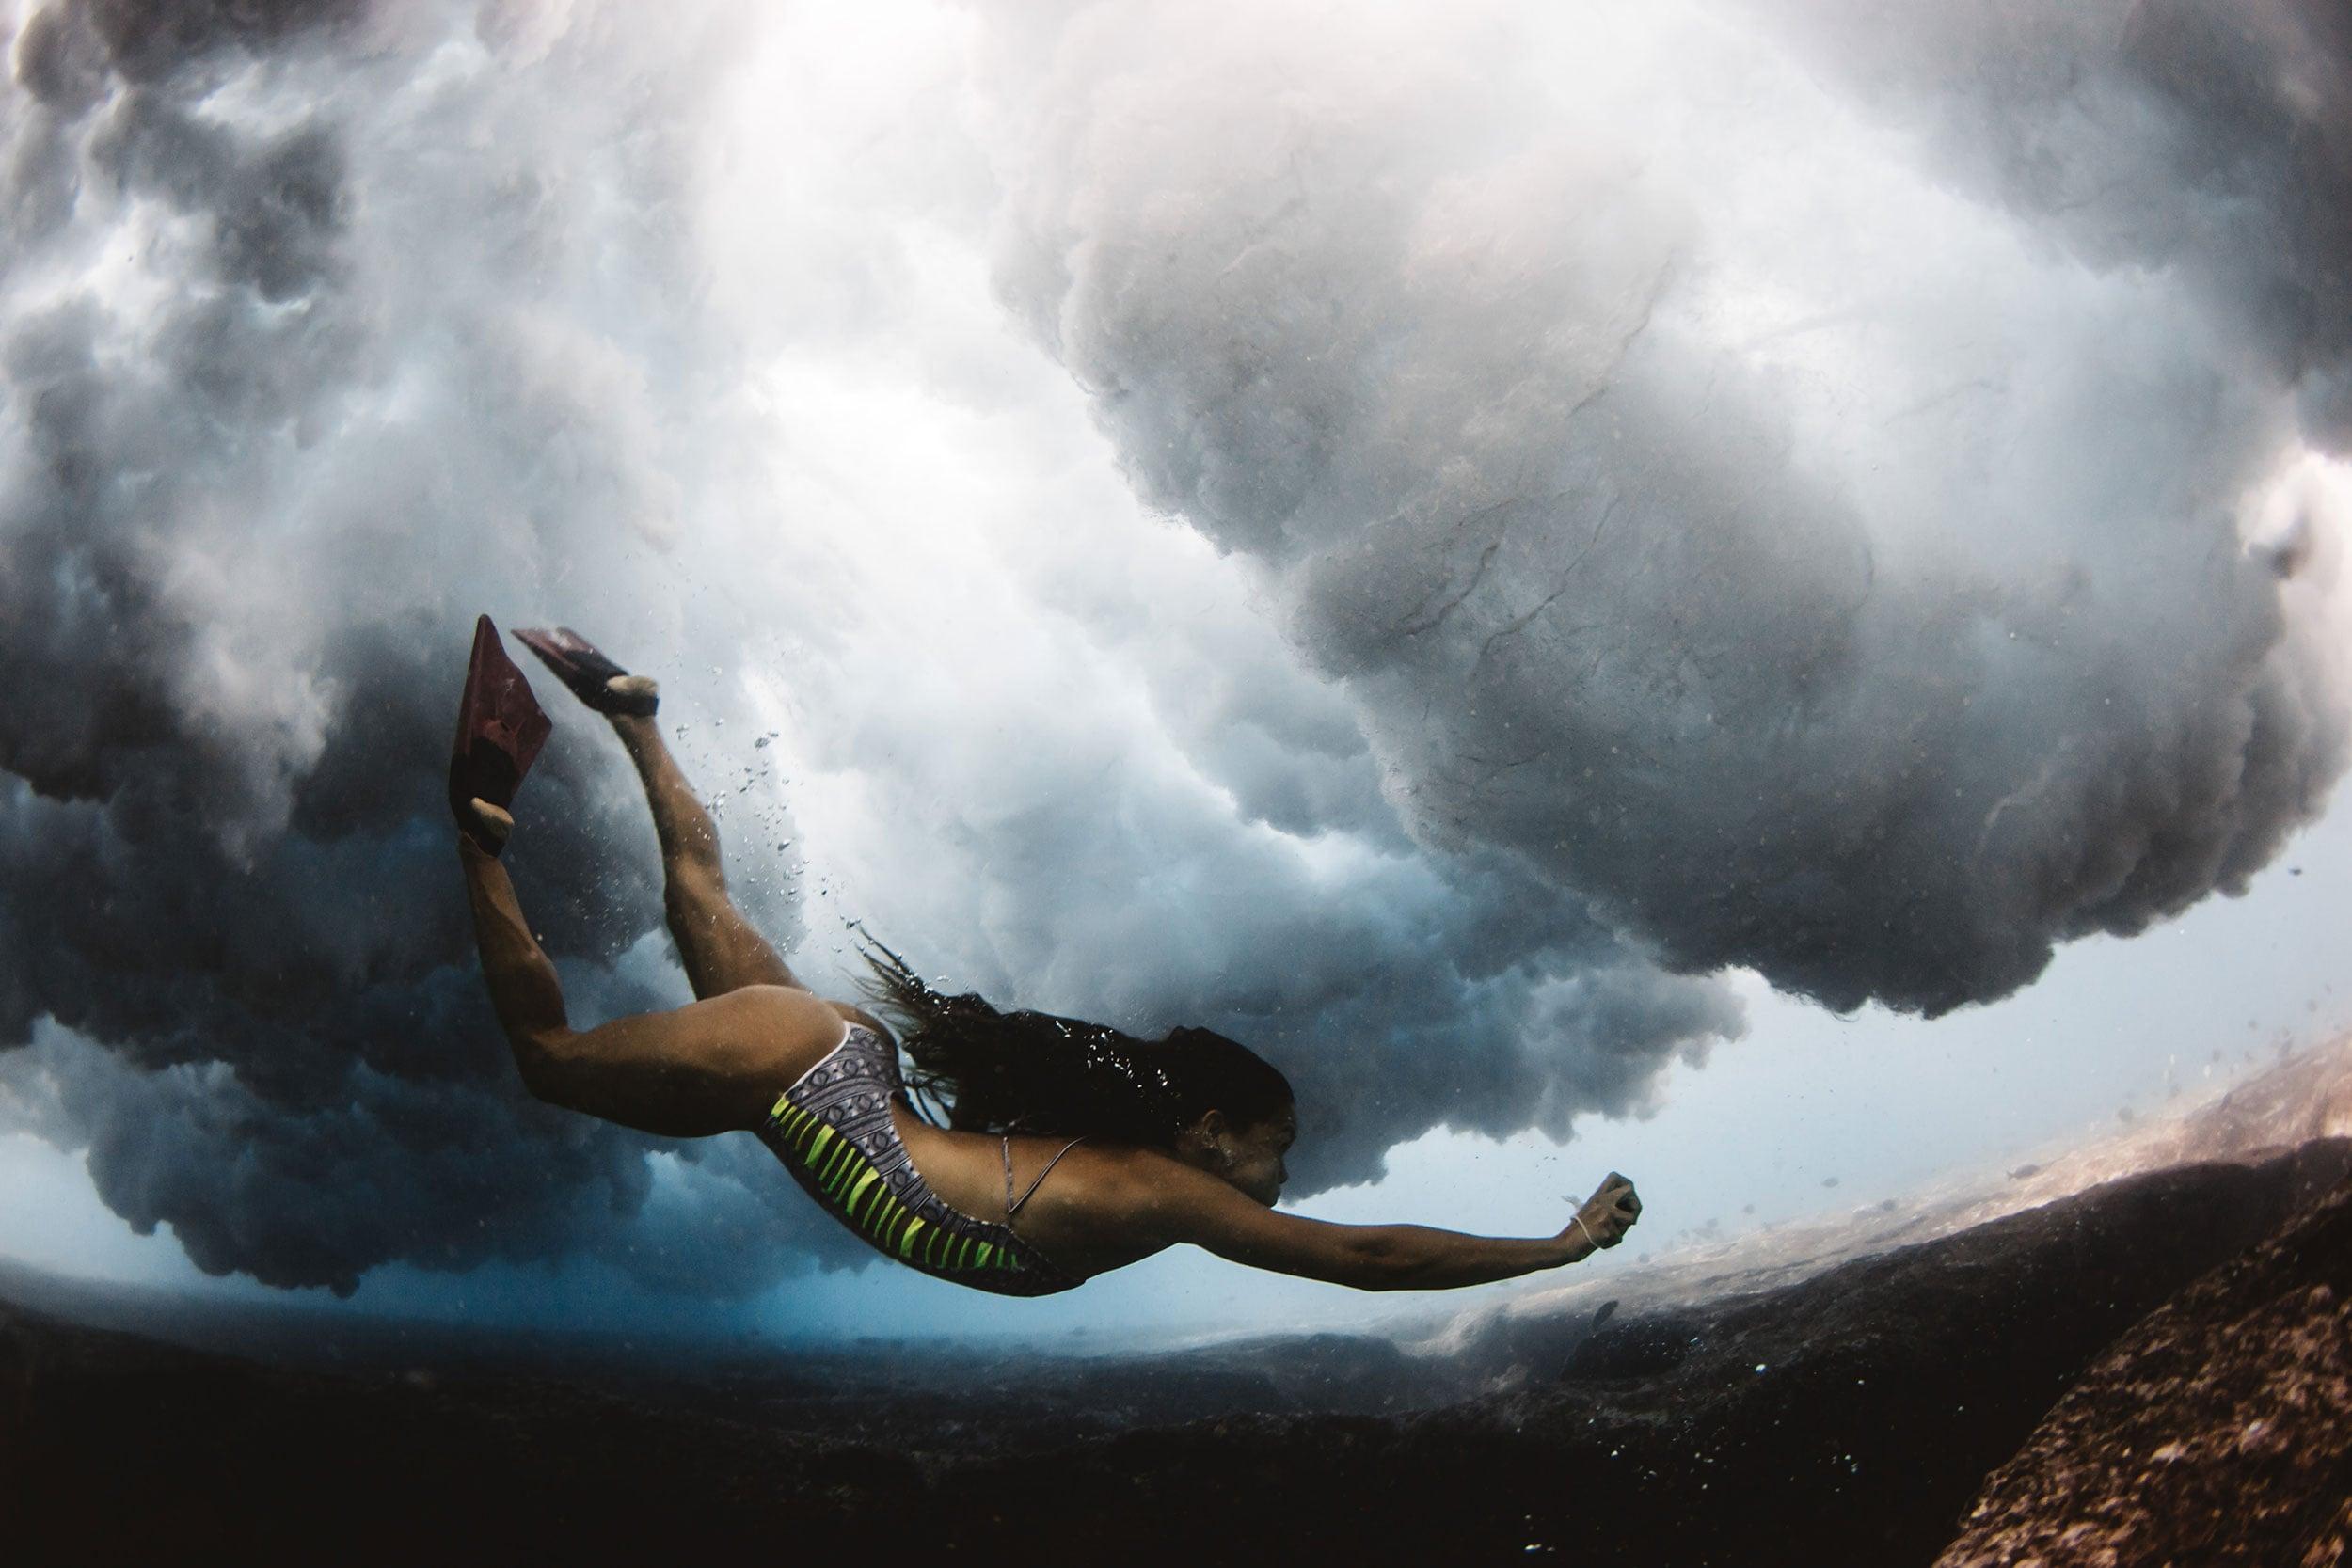 bikini babe below the waves at pipeline